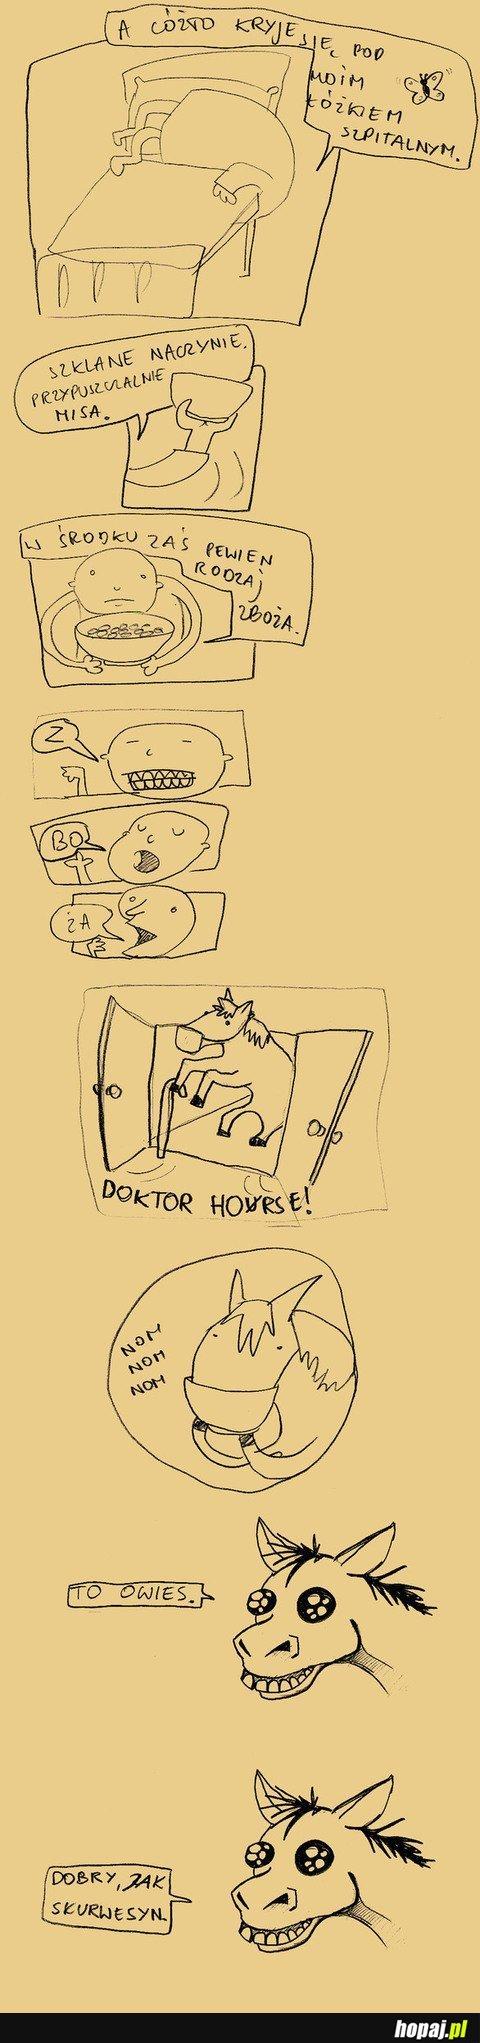 Doktor Horse